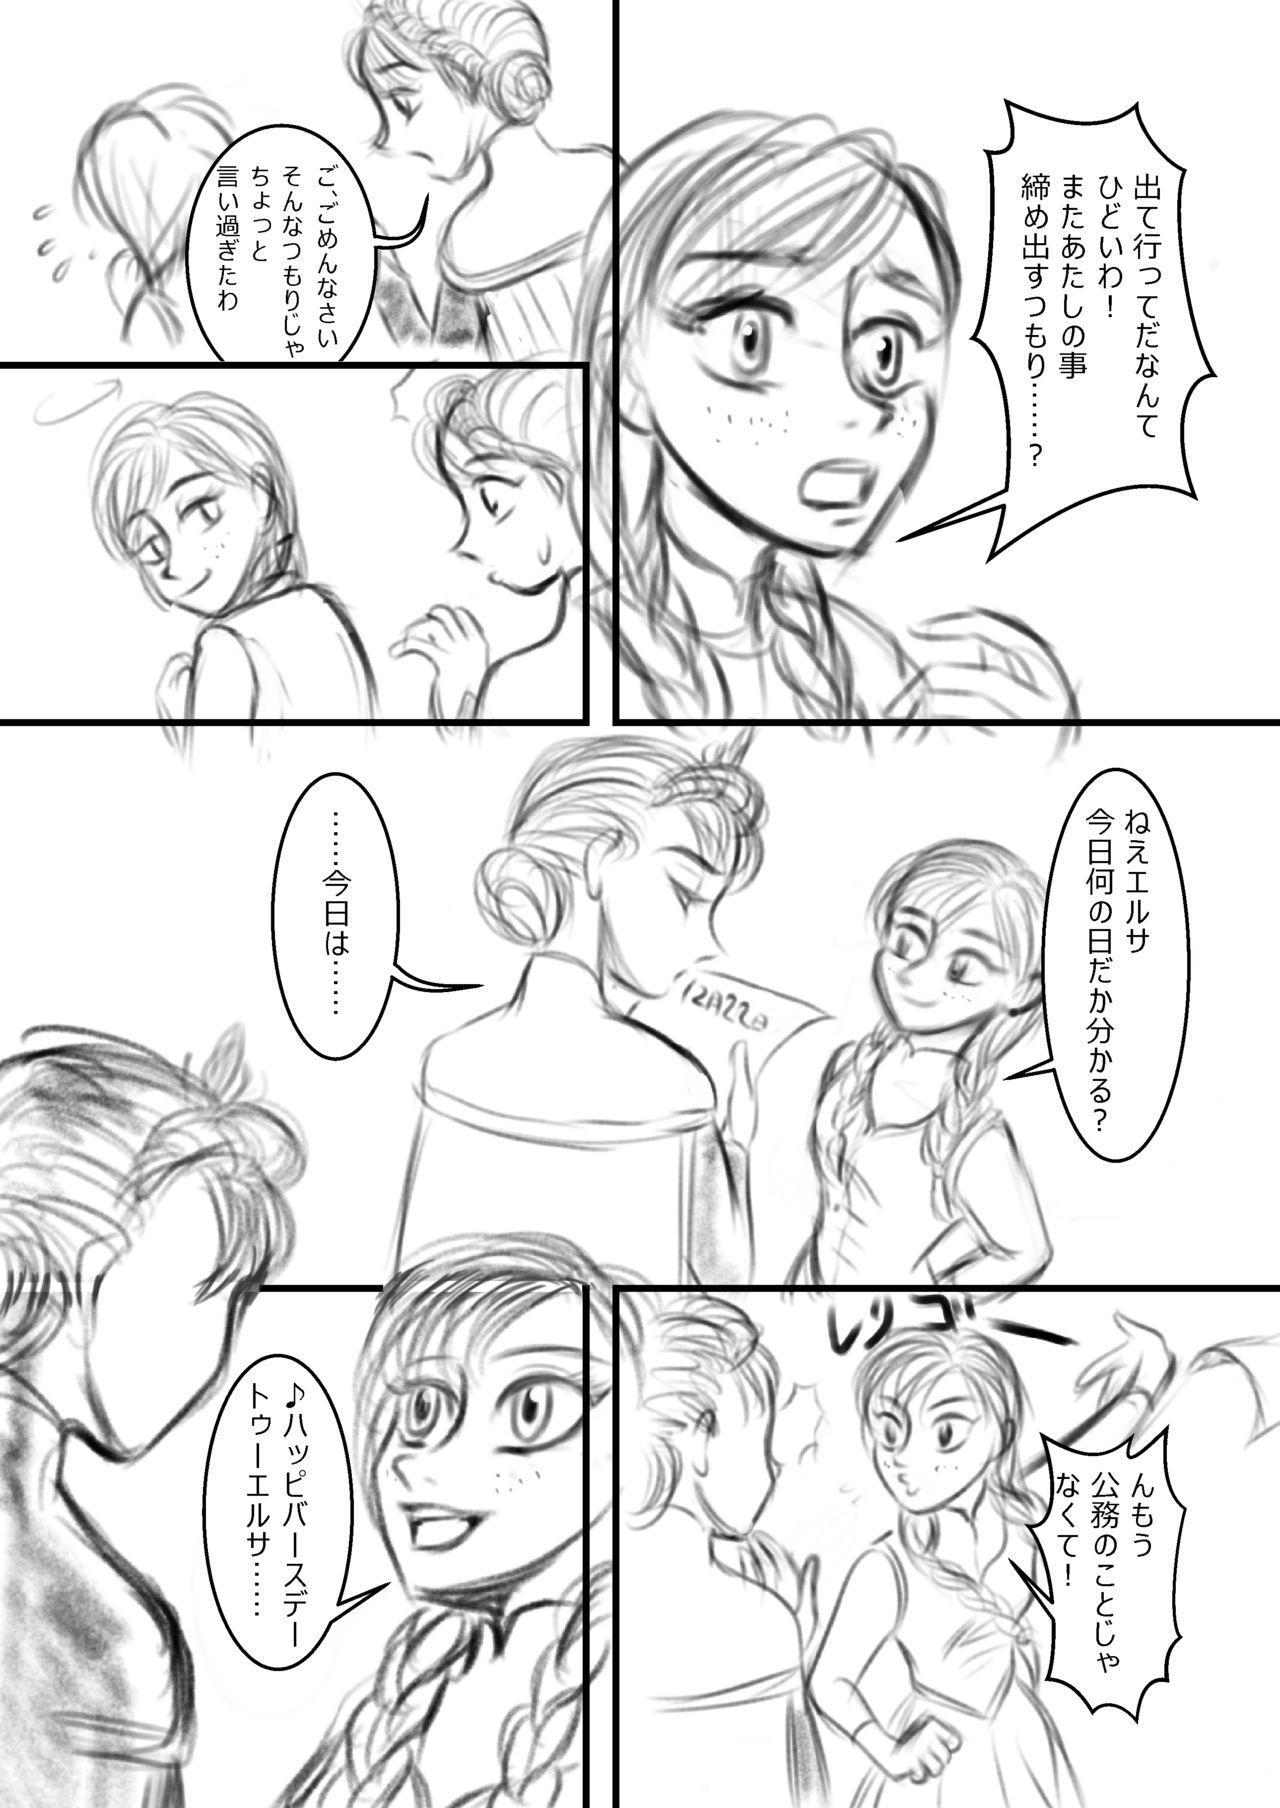 Ana no Surprise 1